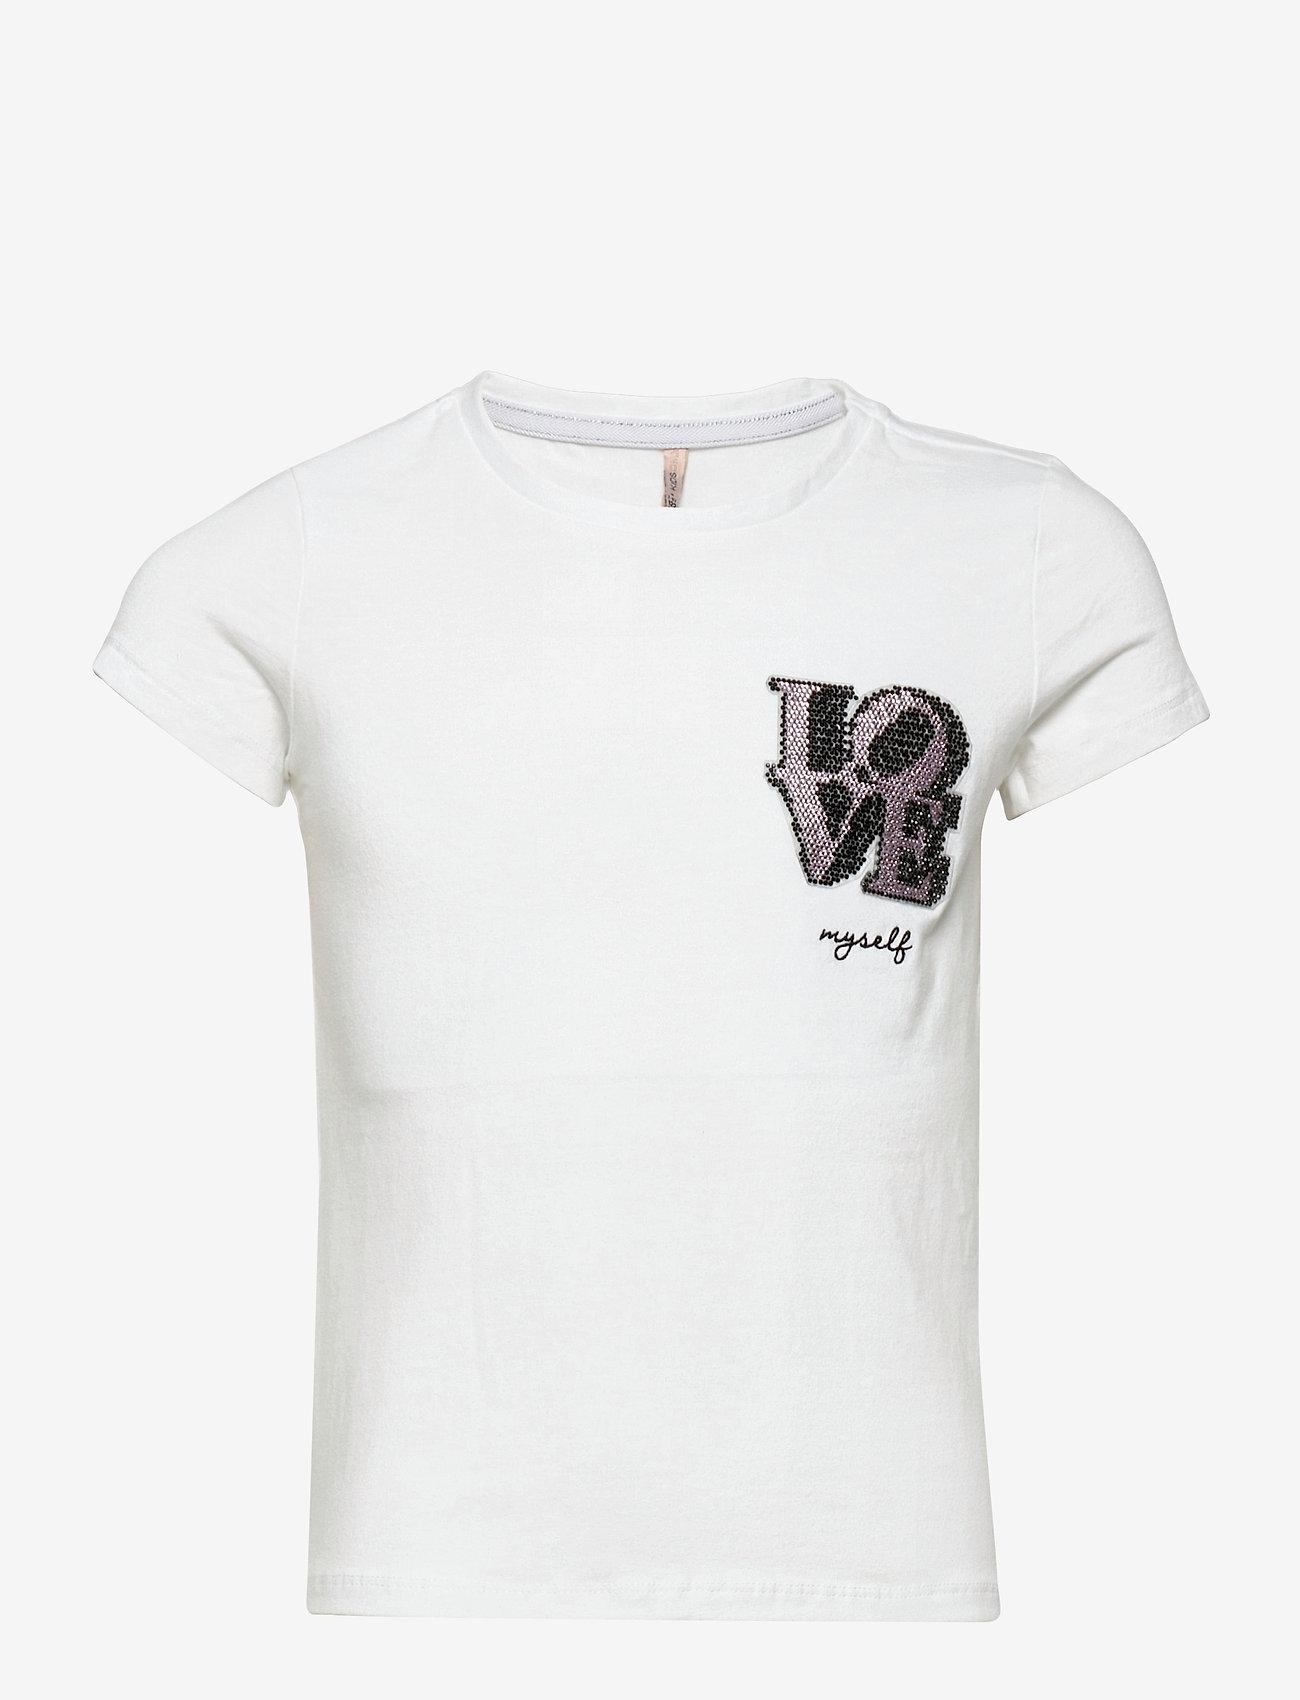 Kids Only - KONKITA LIFE REG S/S TOP CAMERA/LOVE JRS - t-shirts - bright white - 0